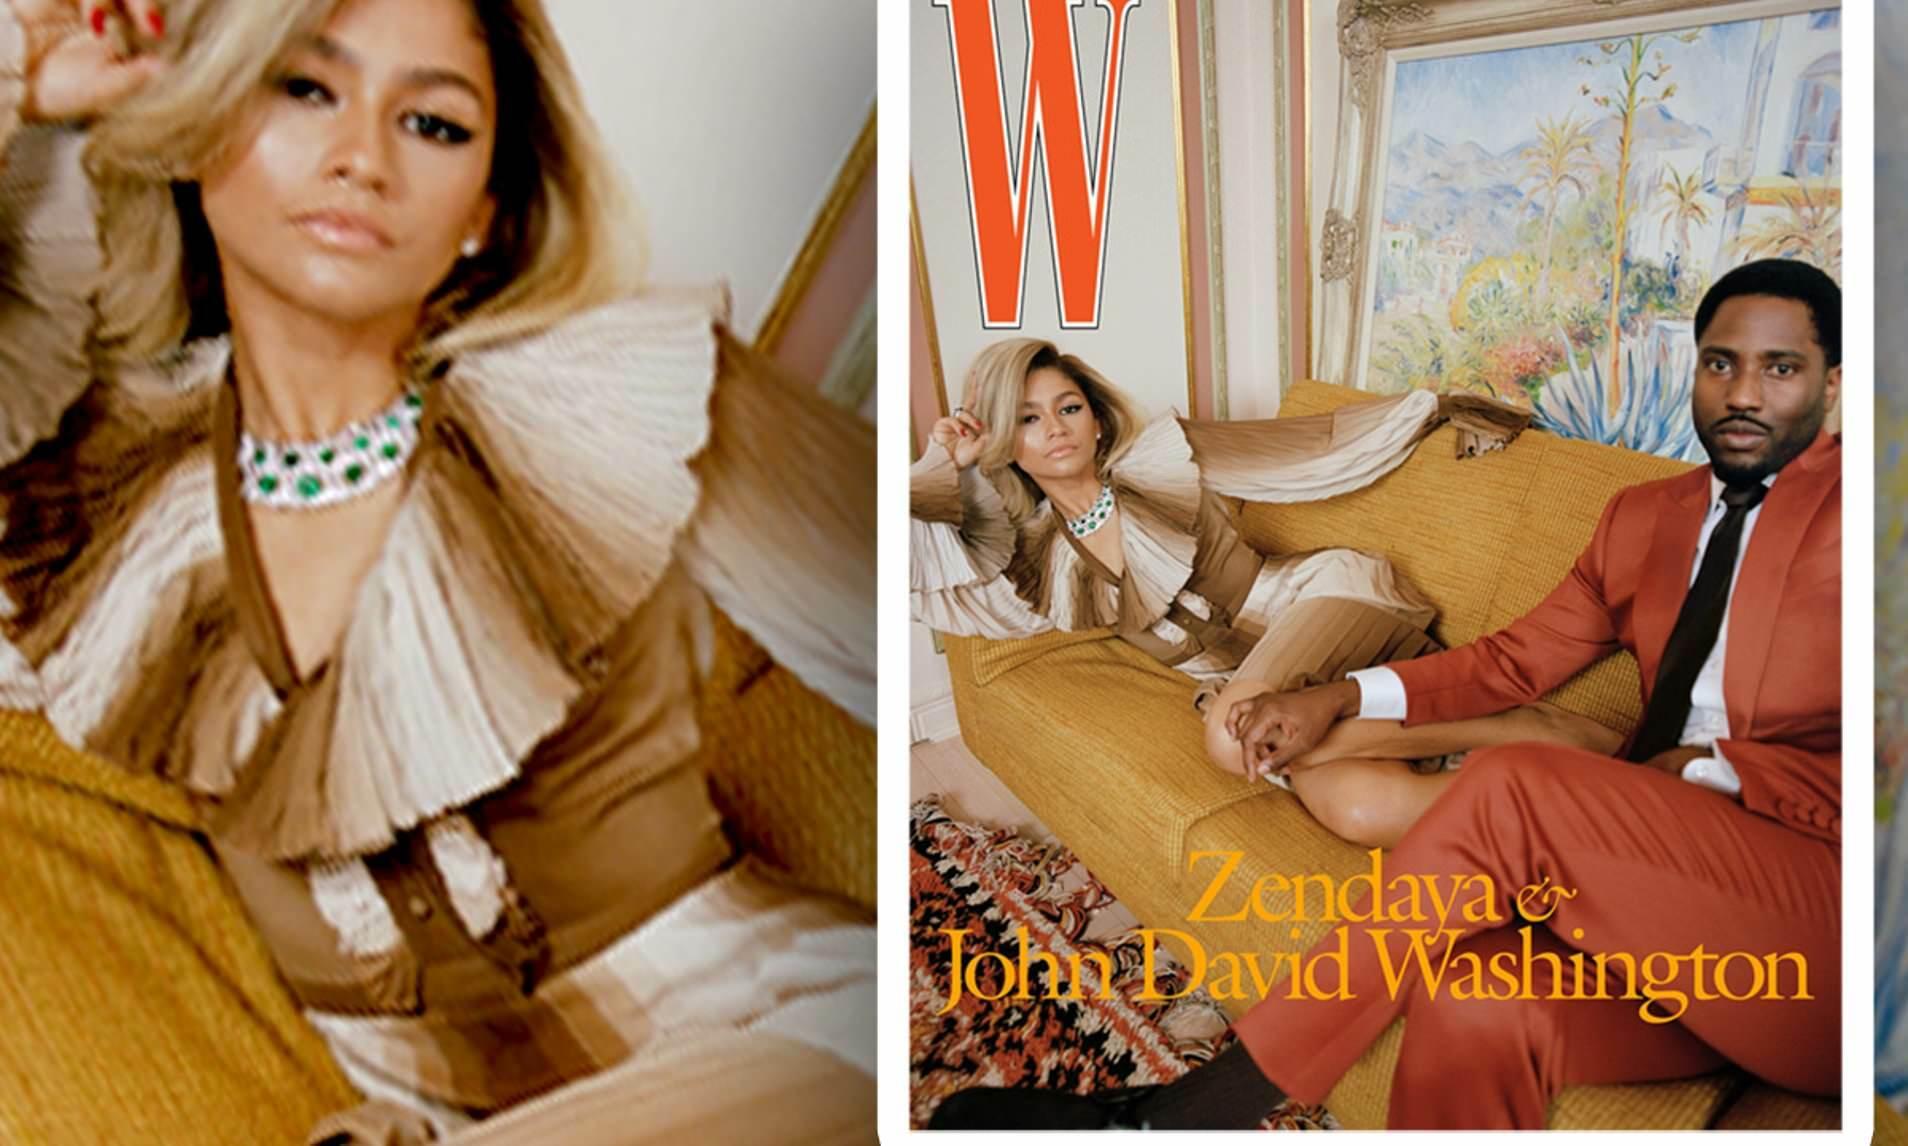 Zendaya Stuns in Gorgeous Gucci Dress on Front Cover of W Magazine with John David Washington!!!